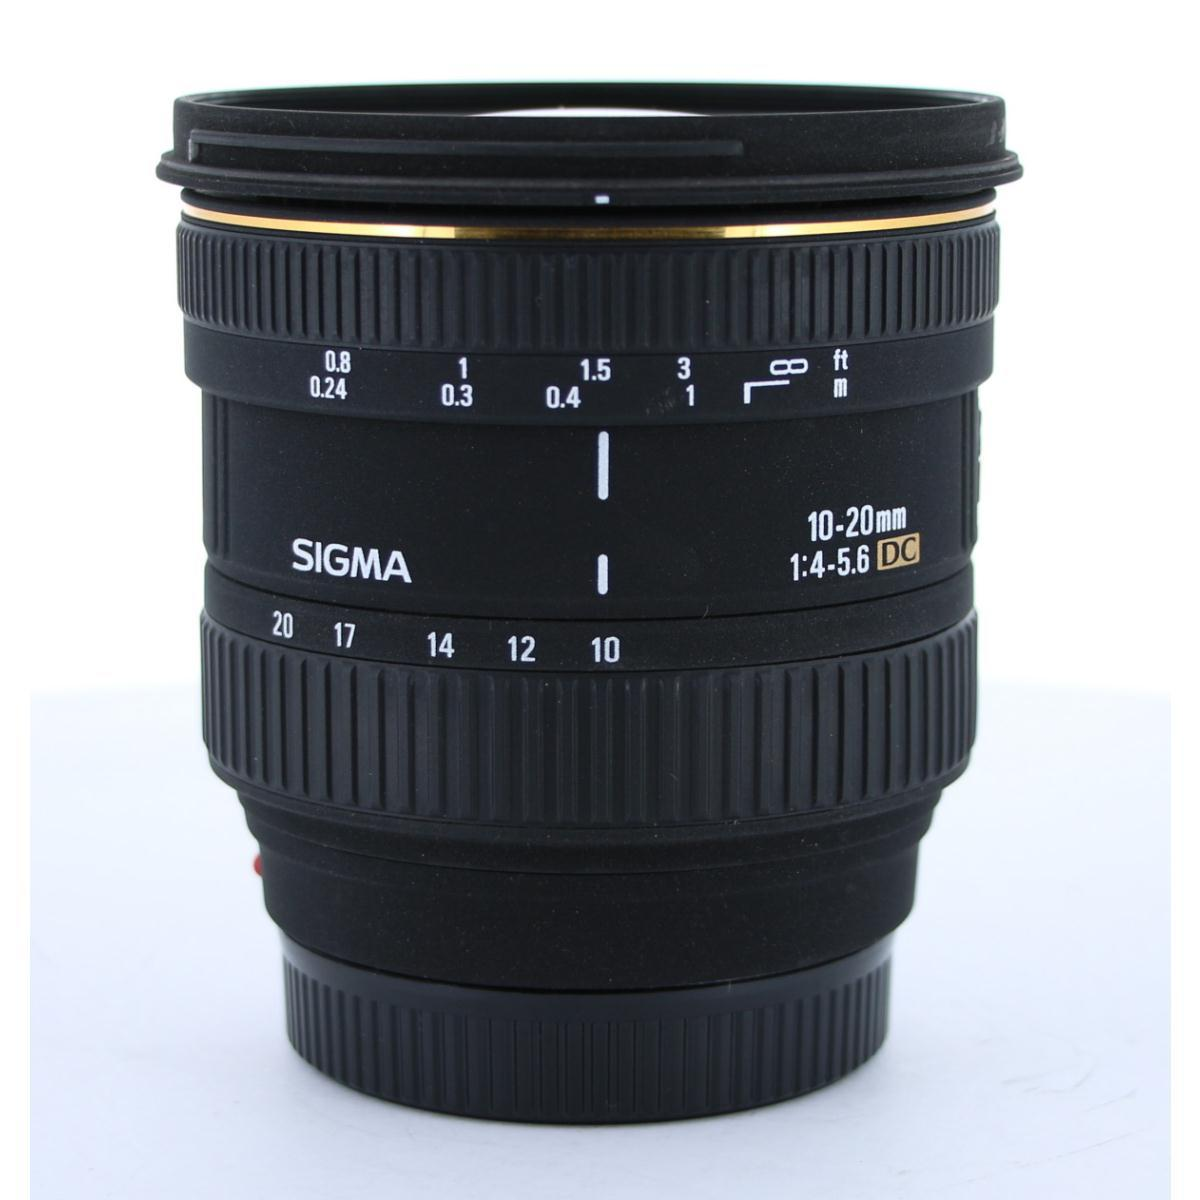 SIGMA α10-20mm F4-5.6EX DC HSM【中古】